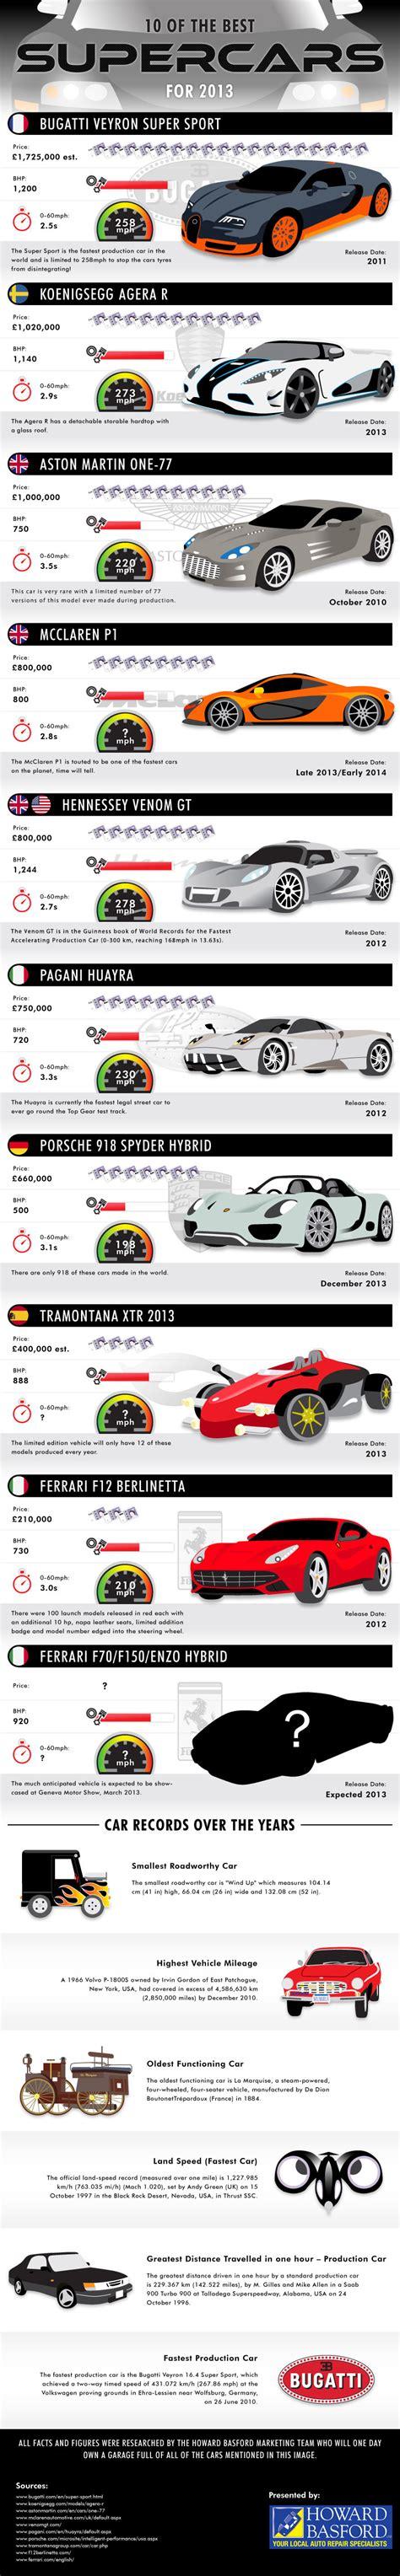 Top 10 Fastest Cars In The World 2013 List Wwwimgkid